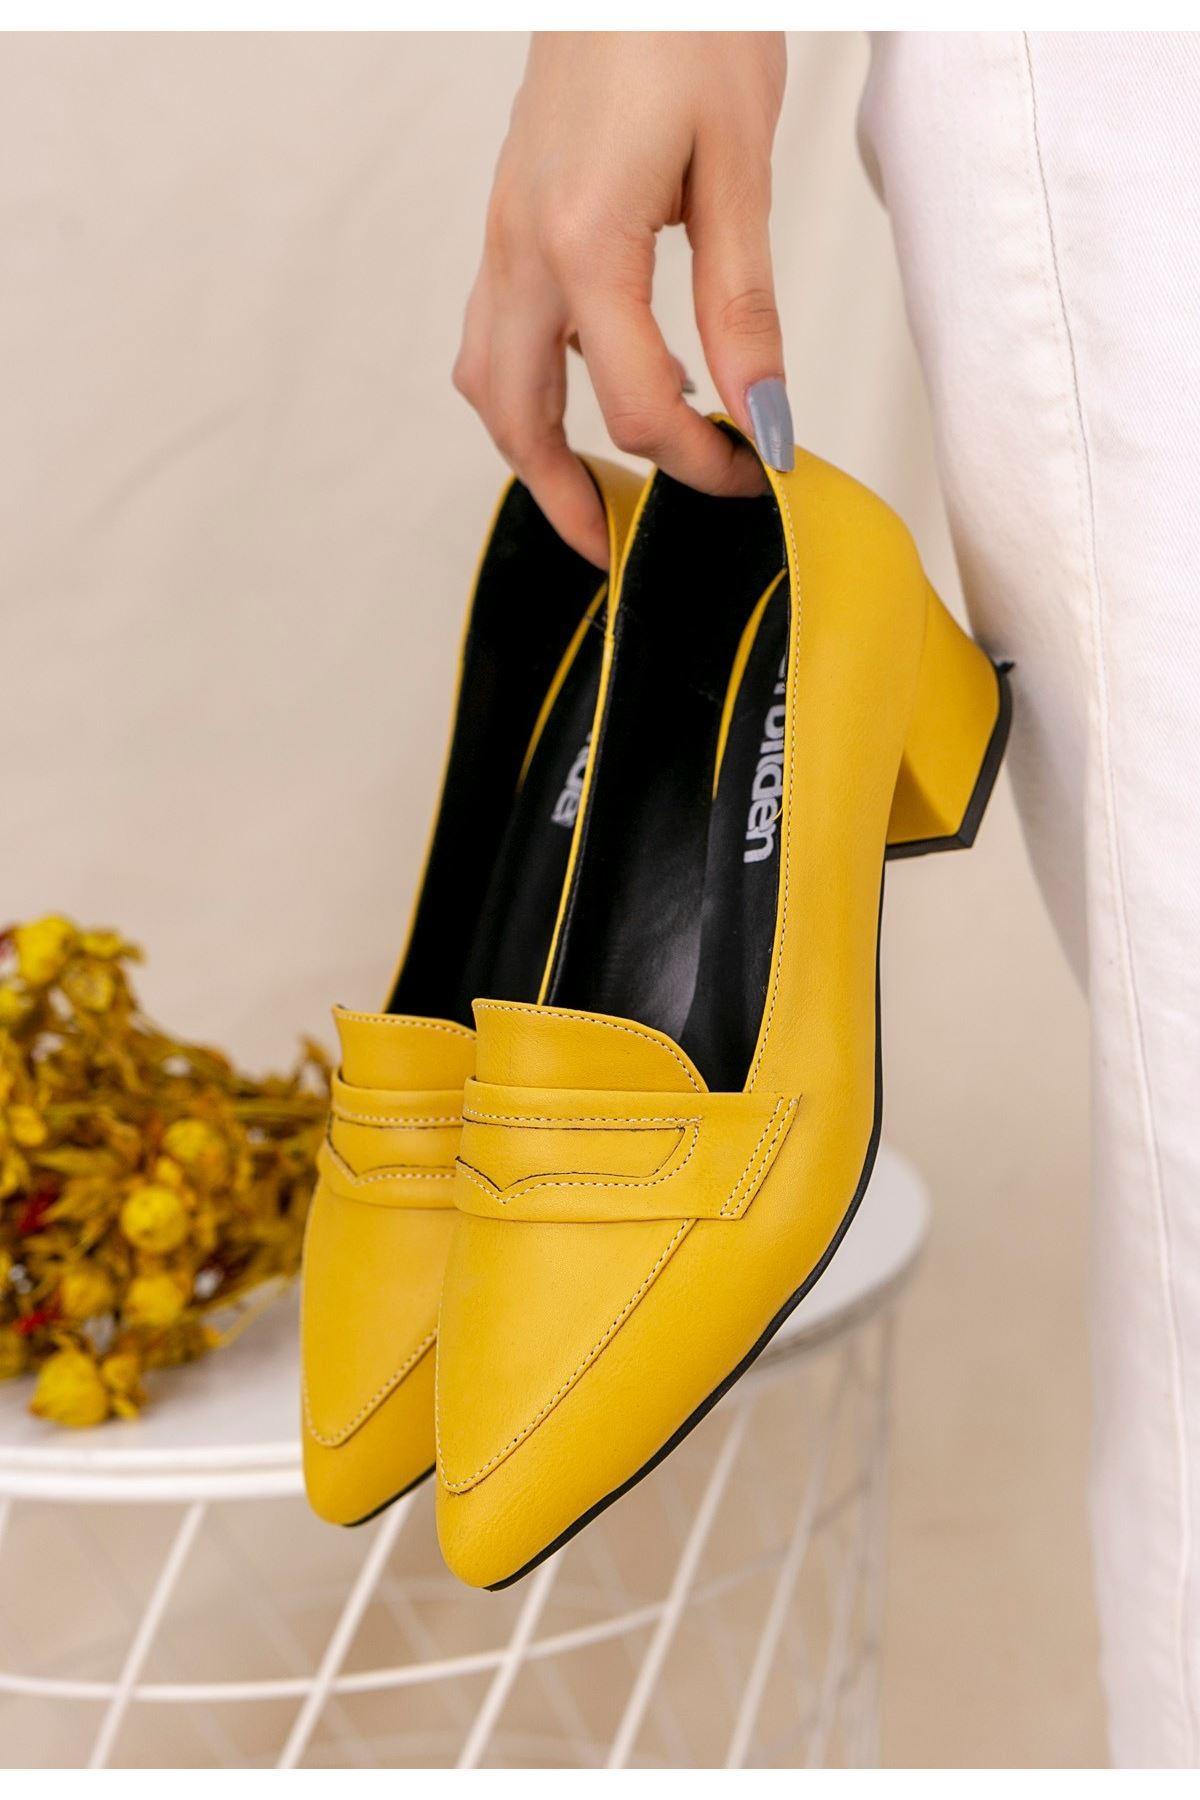 Reyna Hardal Cilt Topuklu Ayakkabı